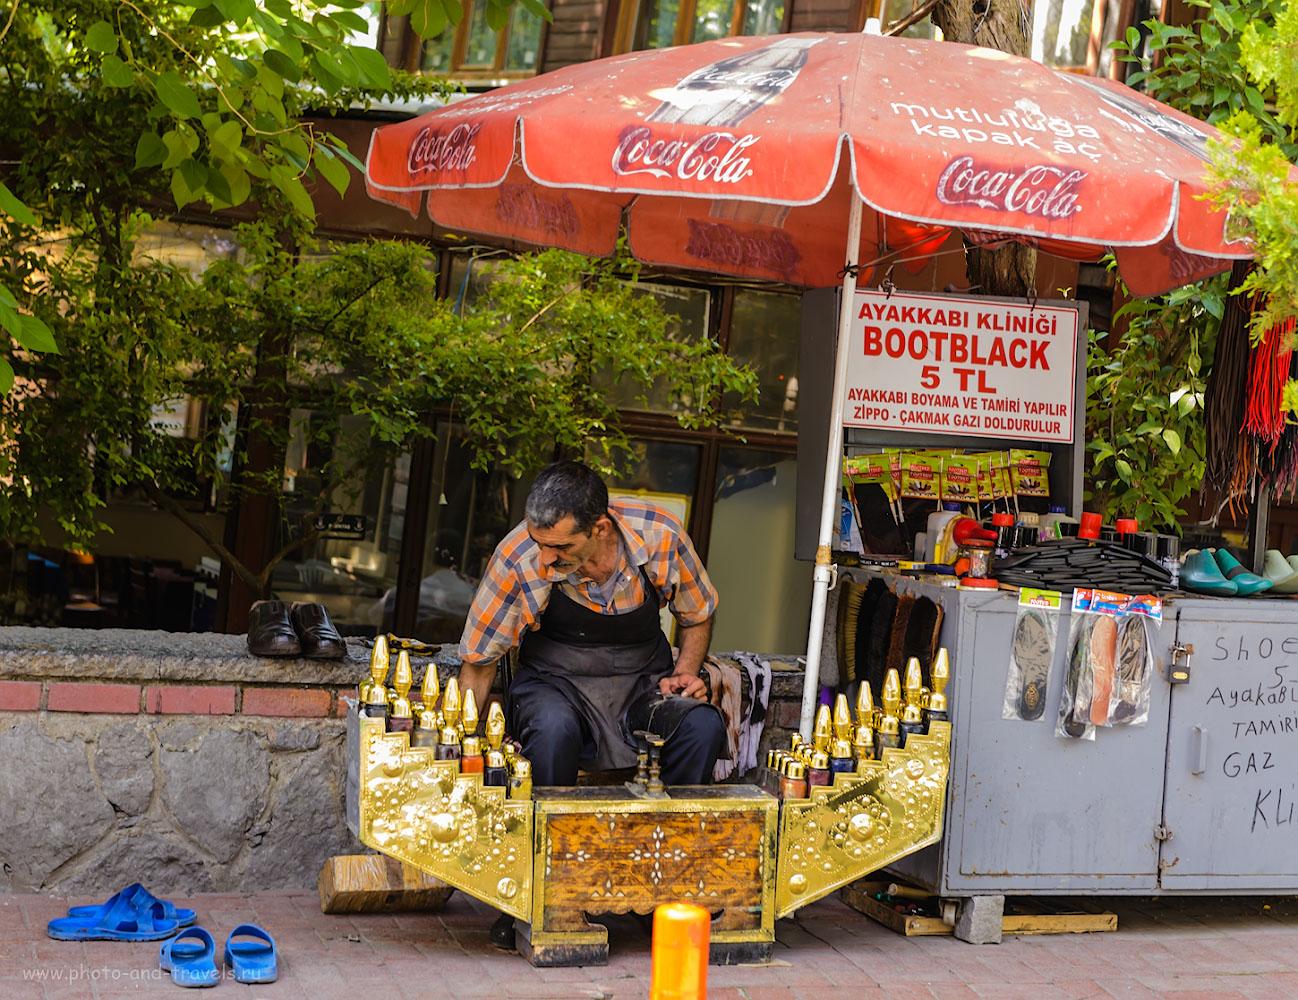 Фото 5. Чистильщик обуви в Стамбуле. 1/60, 1.33, 4.5, 500, 70.